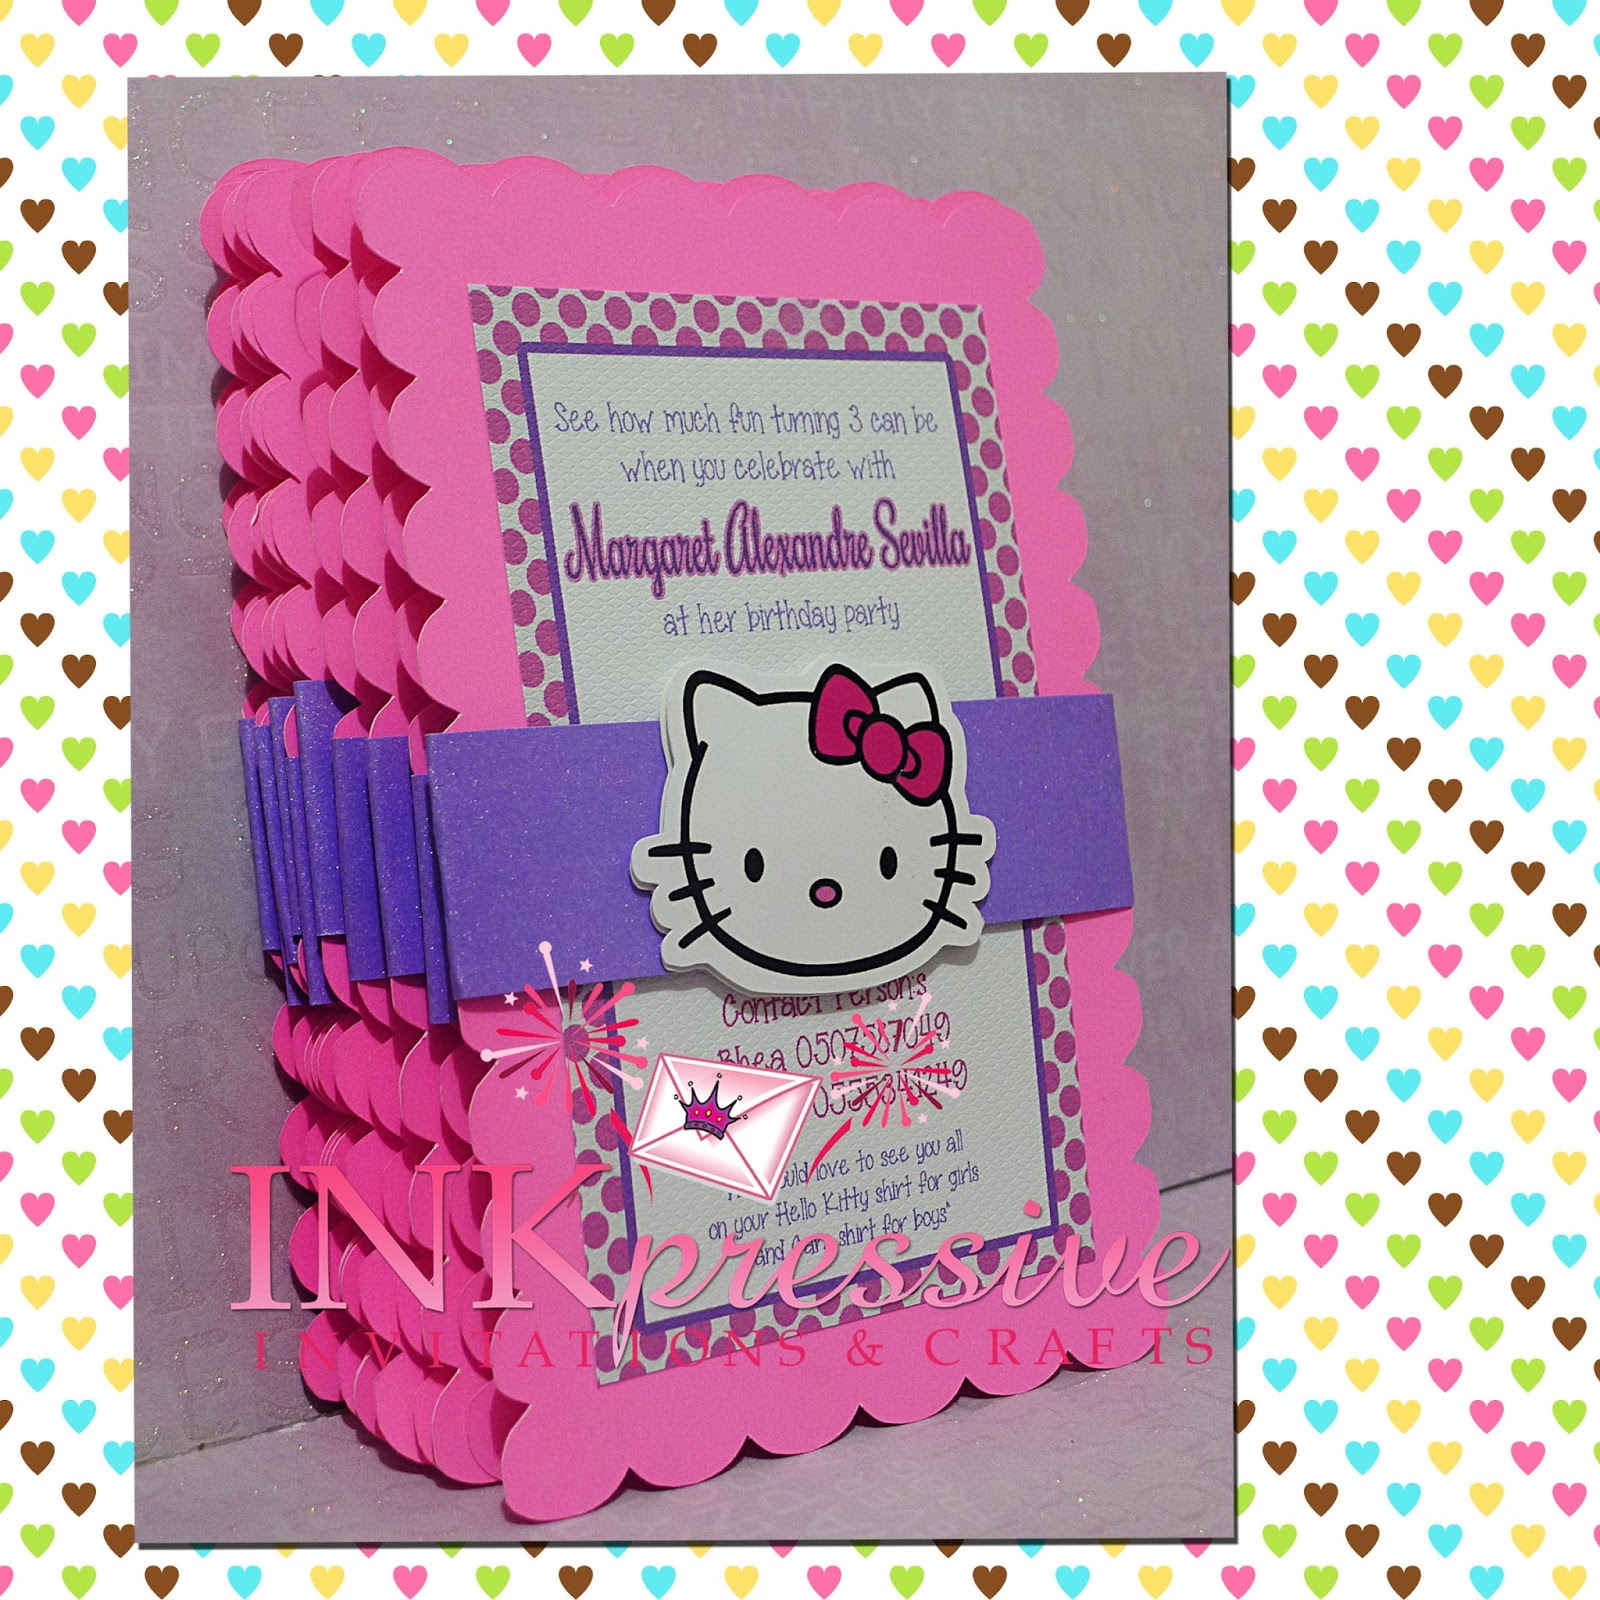 pink purple hello kitty invitation inkpressive invitations pink purple hello kitty invitation